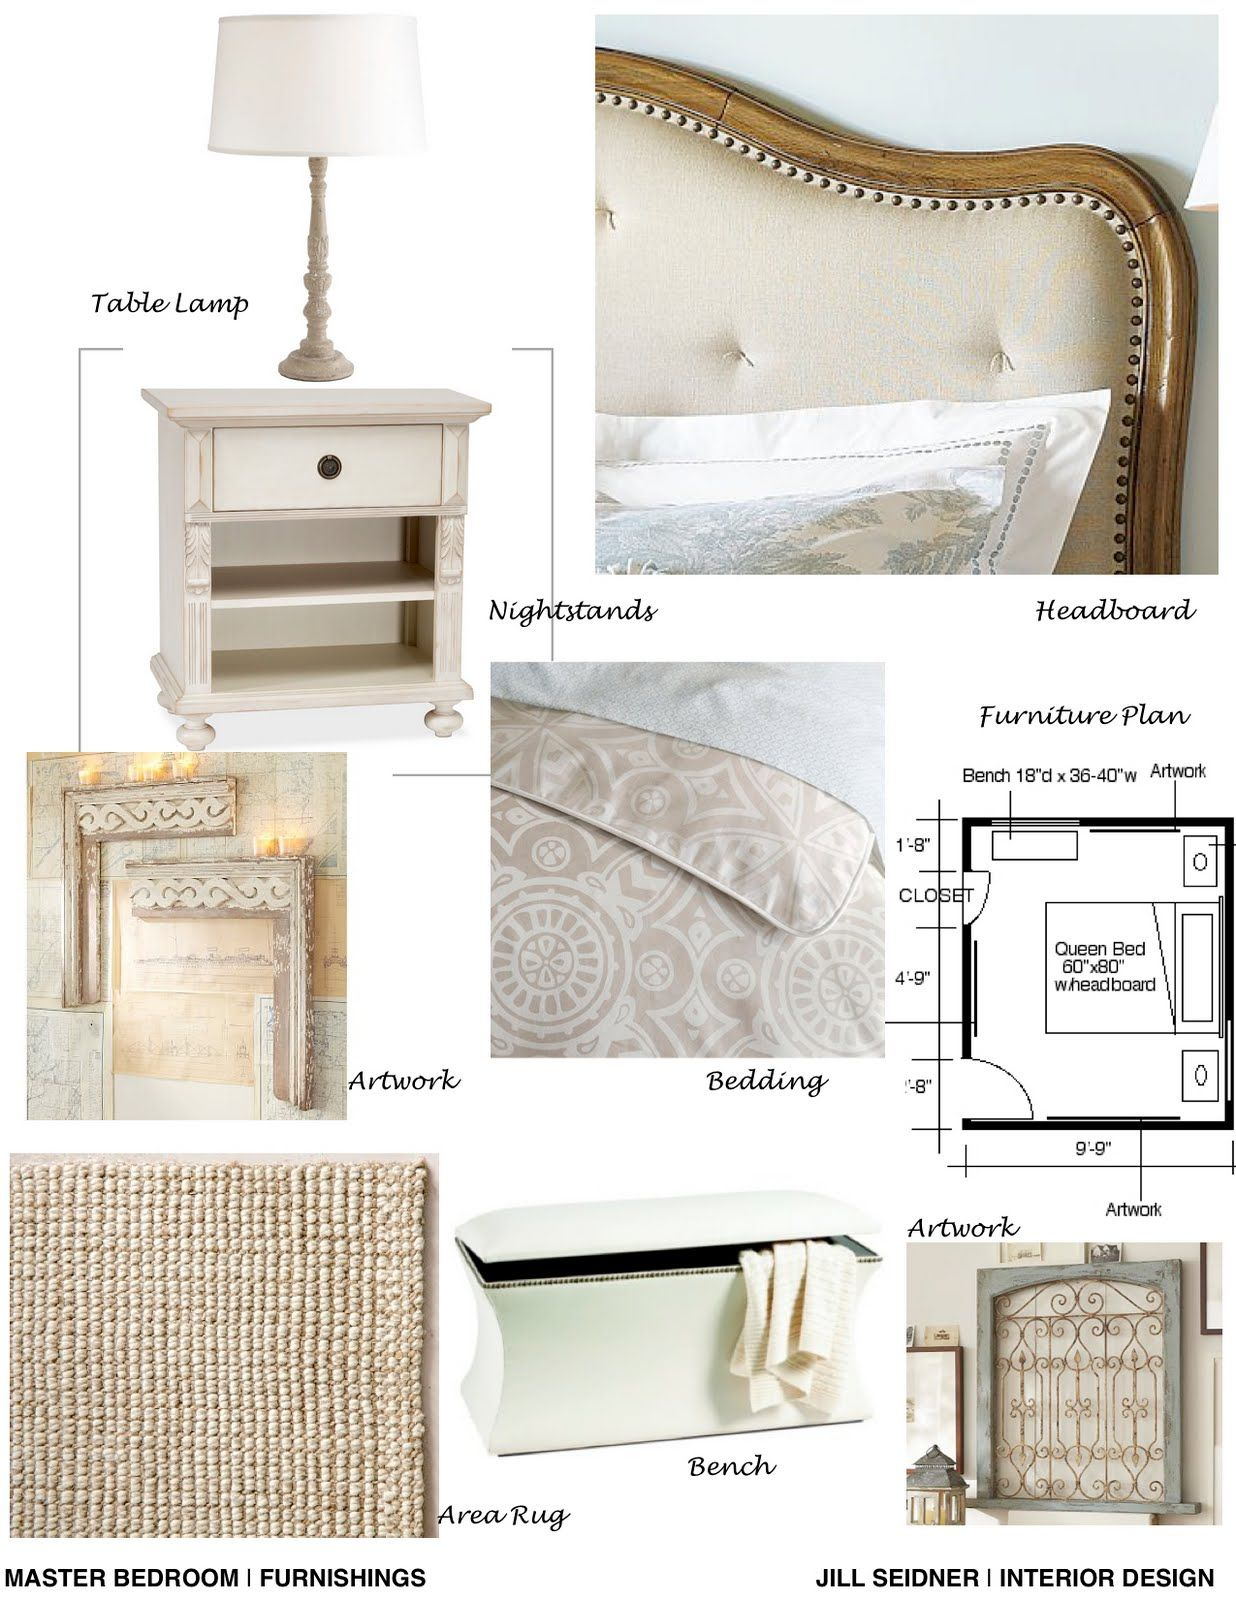 kelly mcguill interior design   kelly mcguill home interior design, Hause ideen